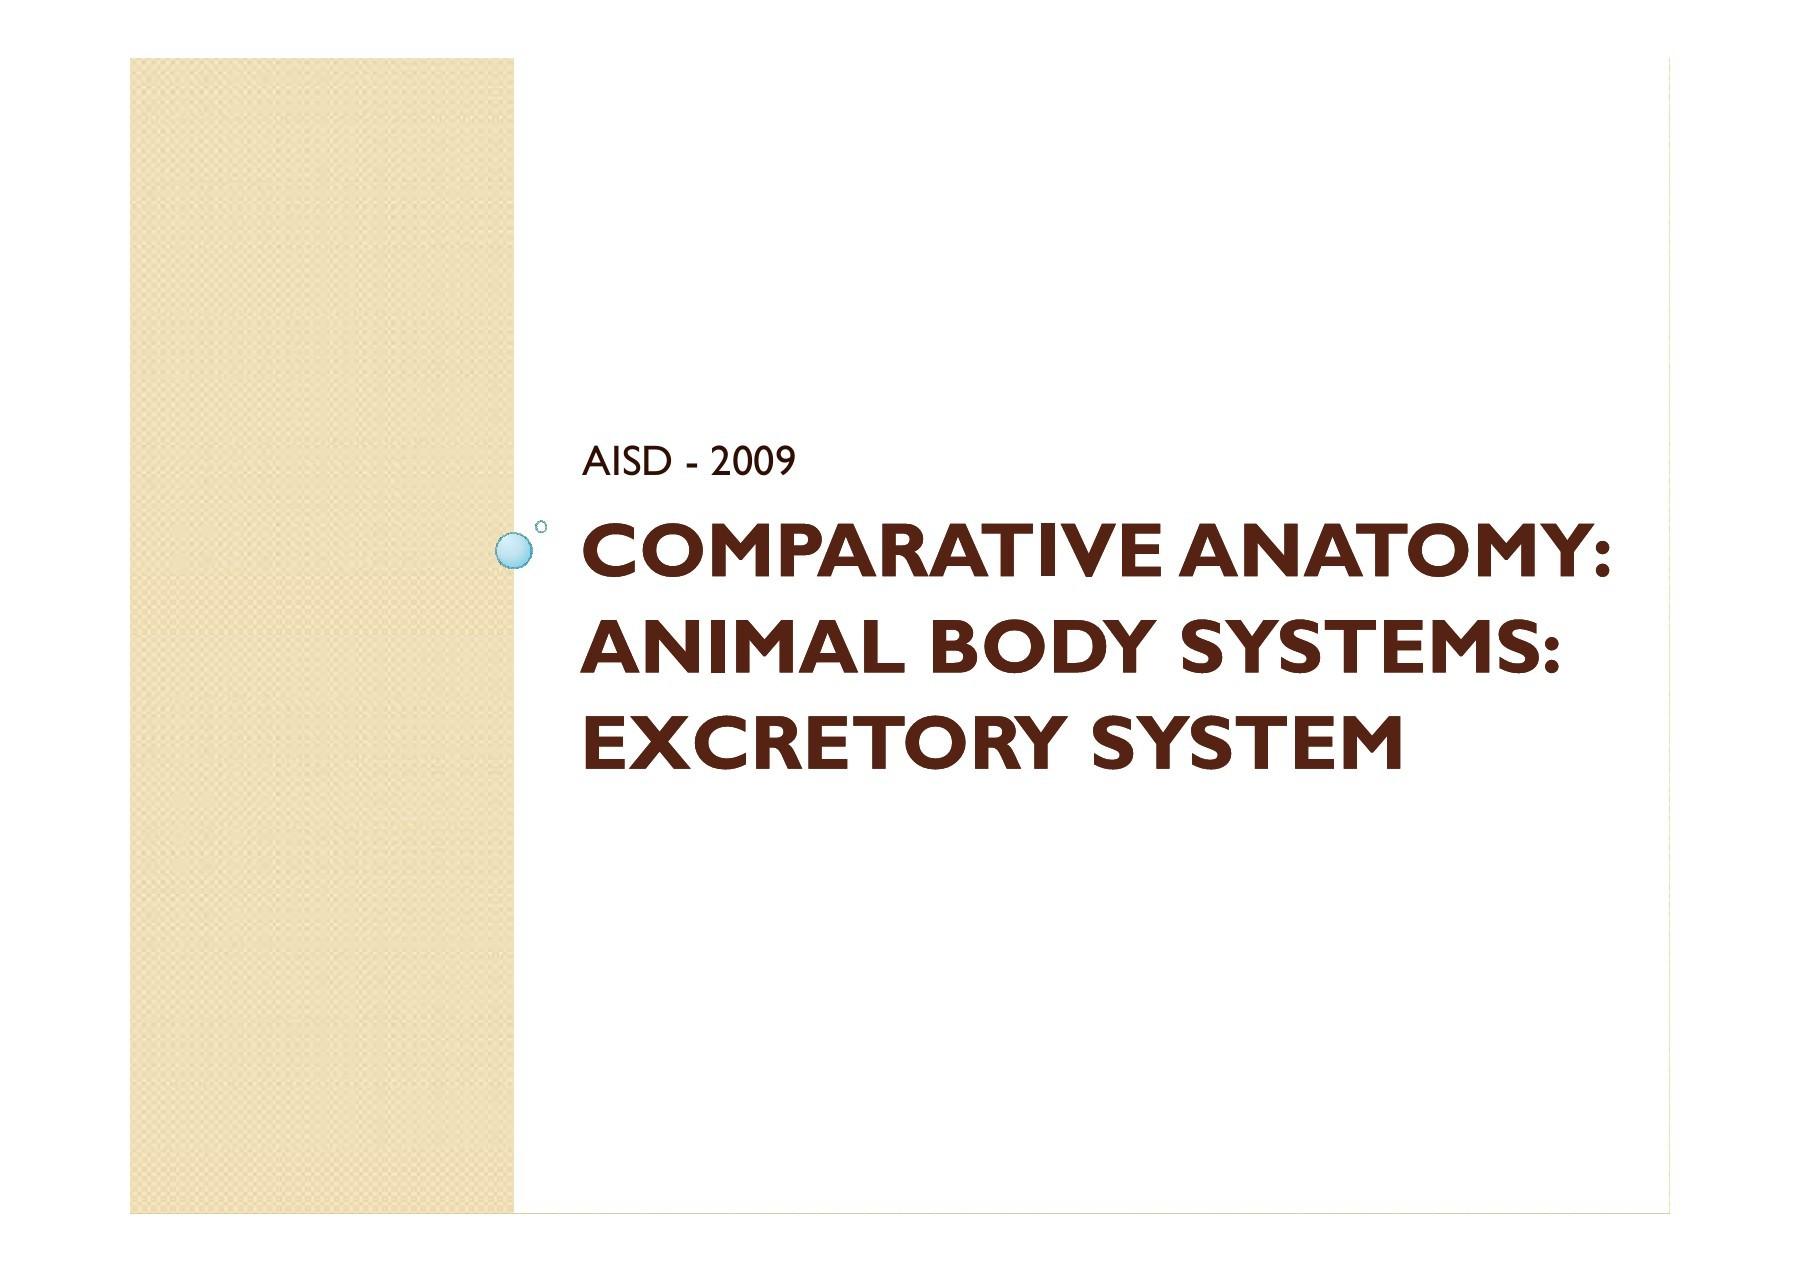 Comparative Anatomy: Animal Body Systems: Excretory System | Focusky